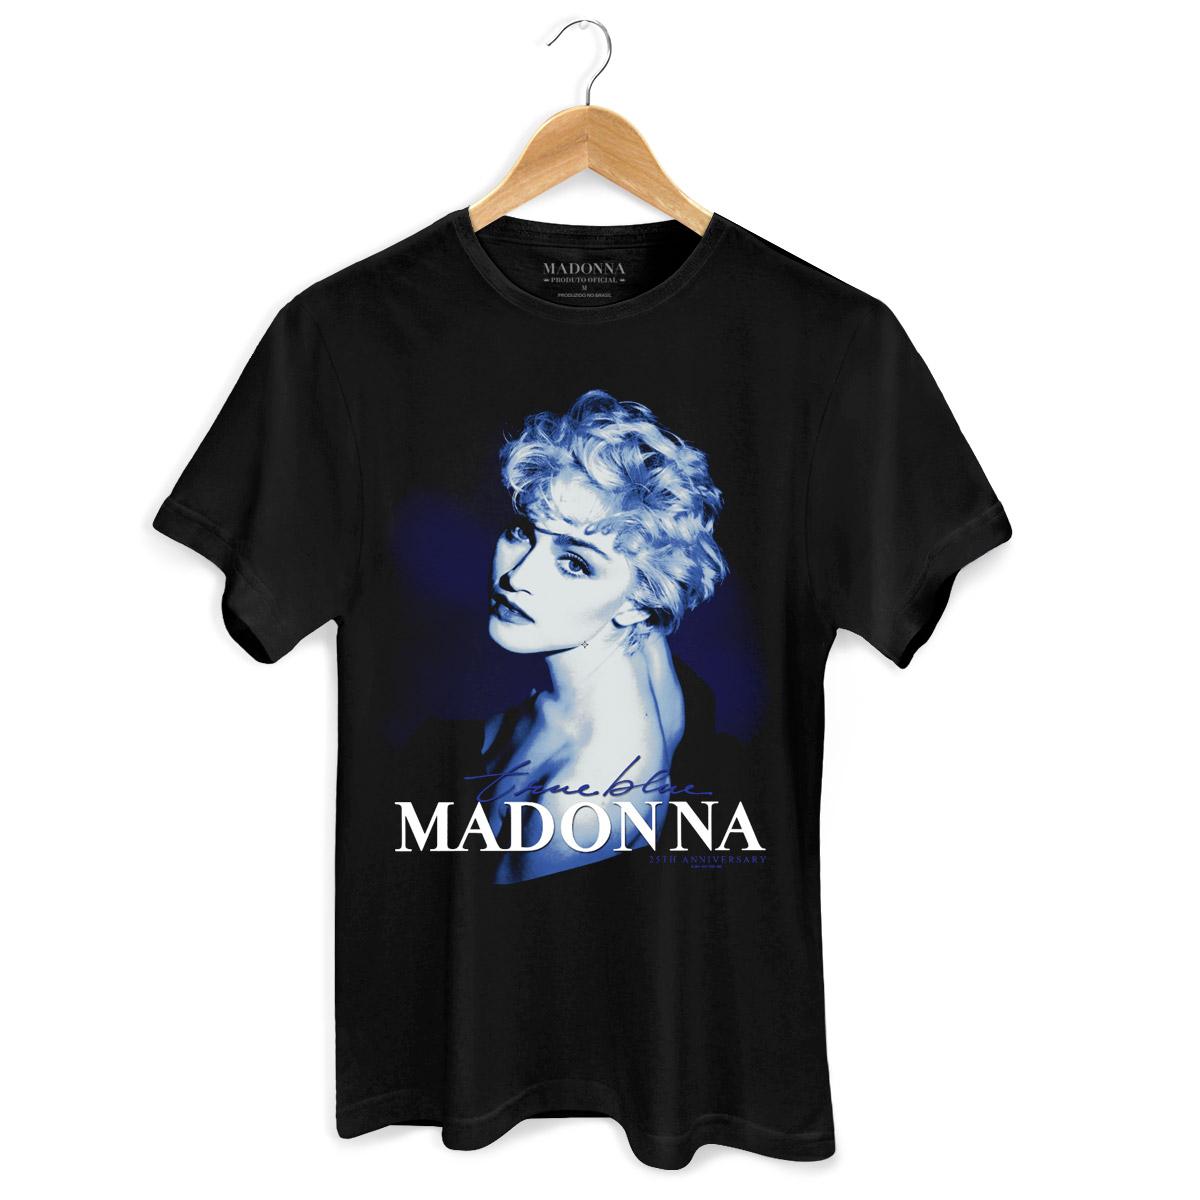 Camiseta Masculina Madonna True Blue  - bandUP Store Marketplace